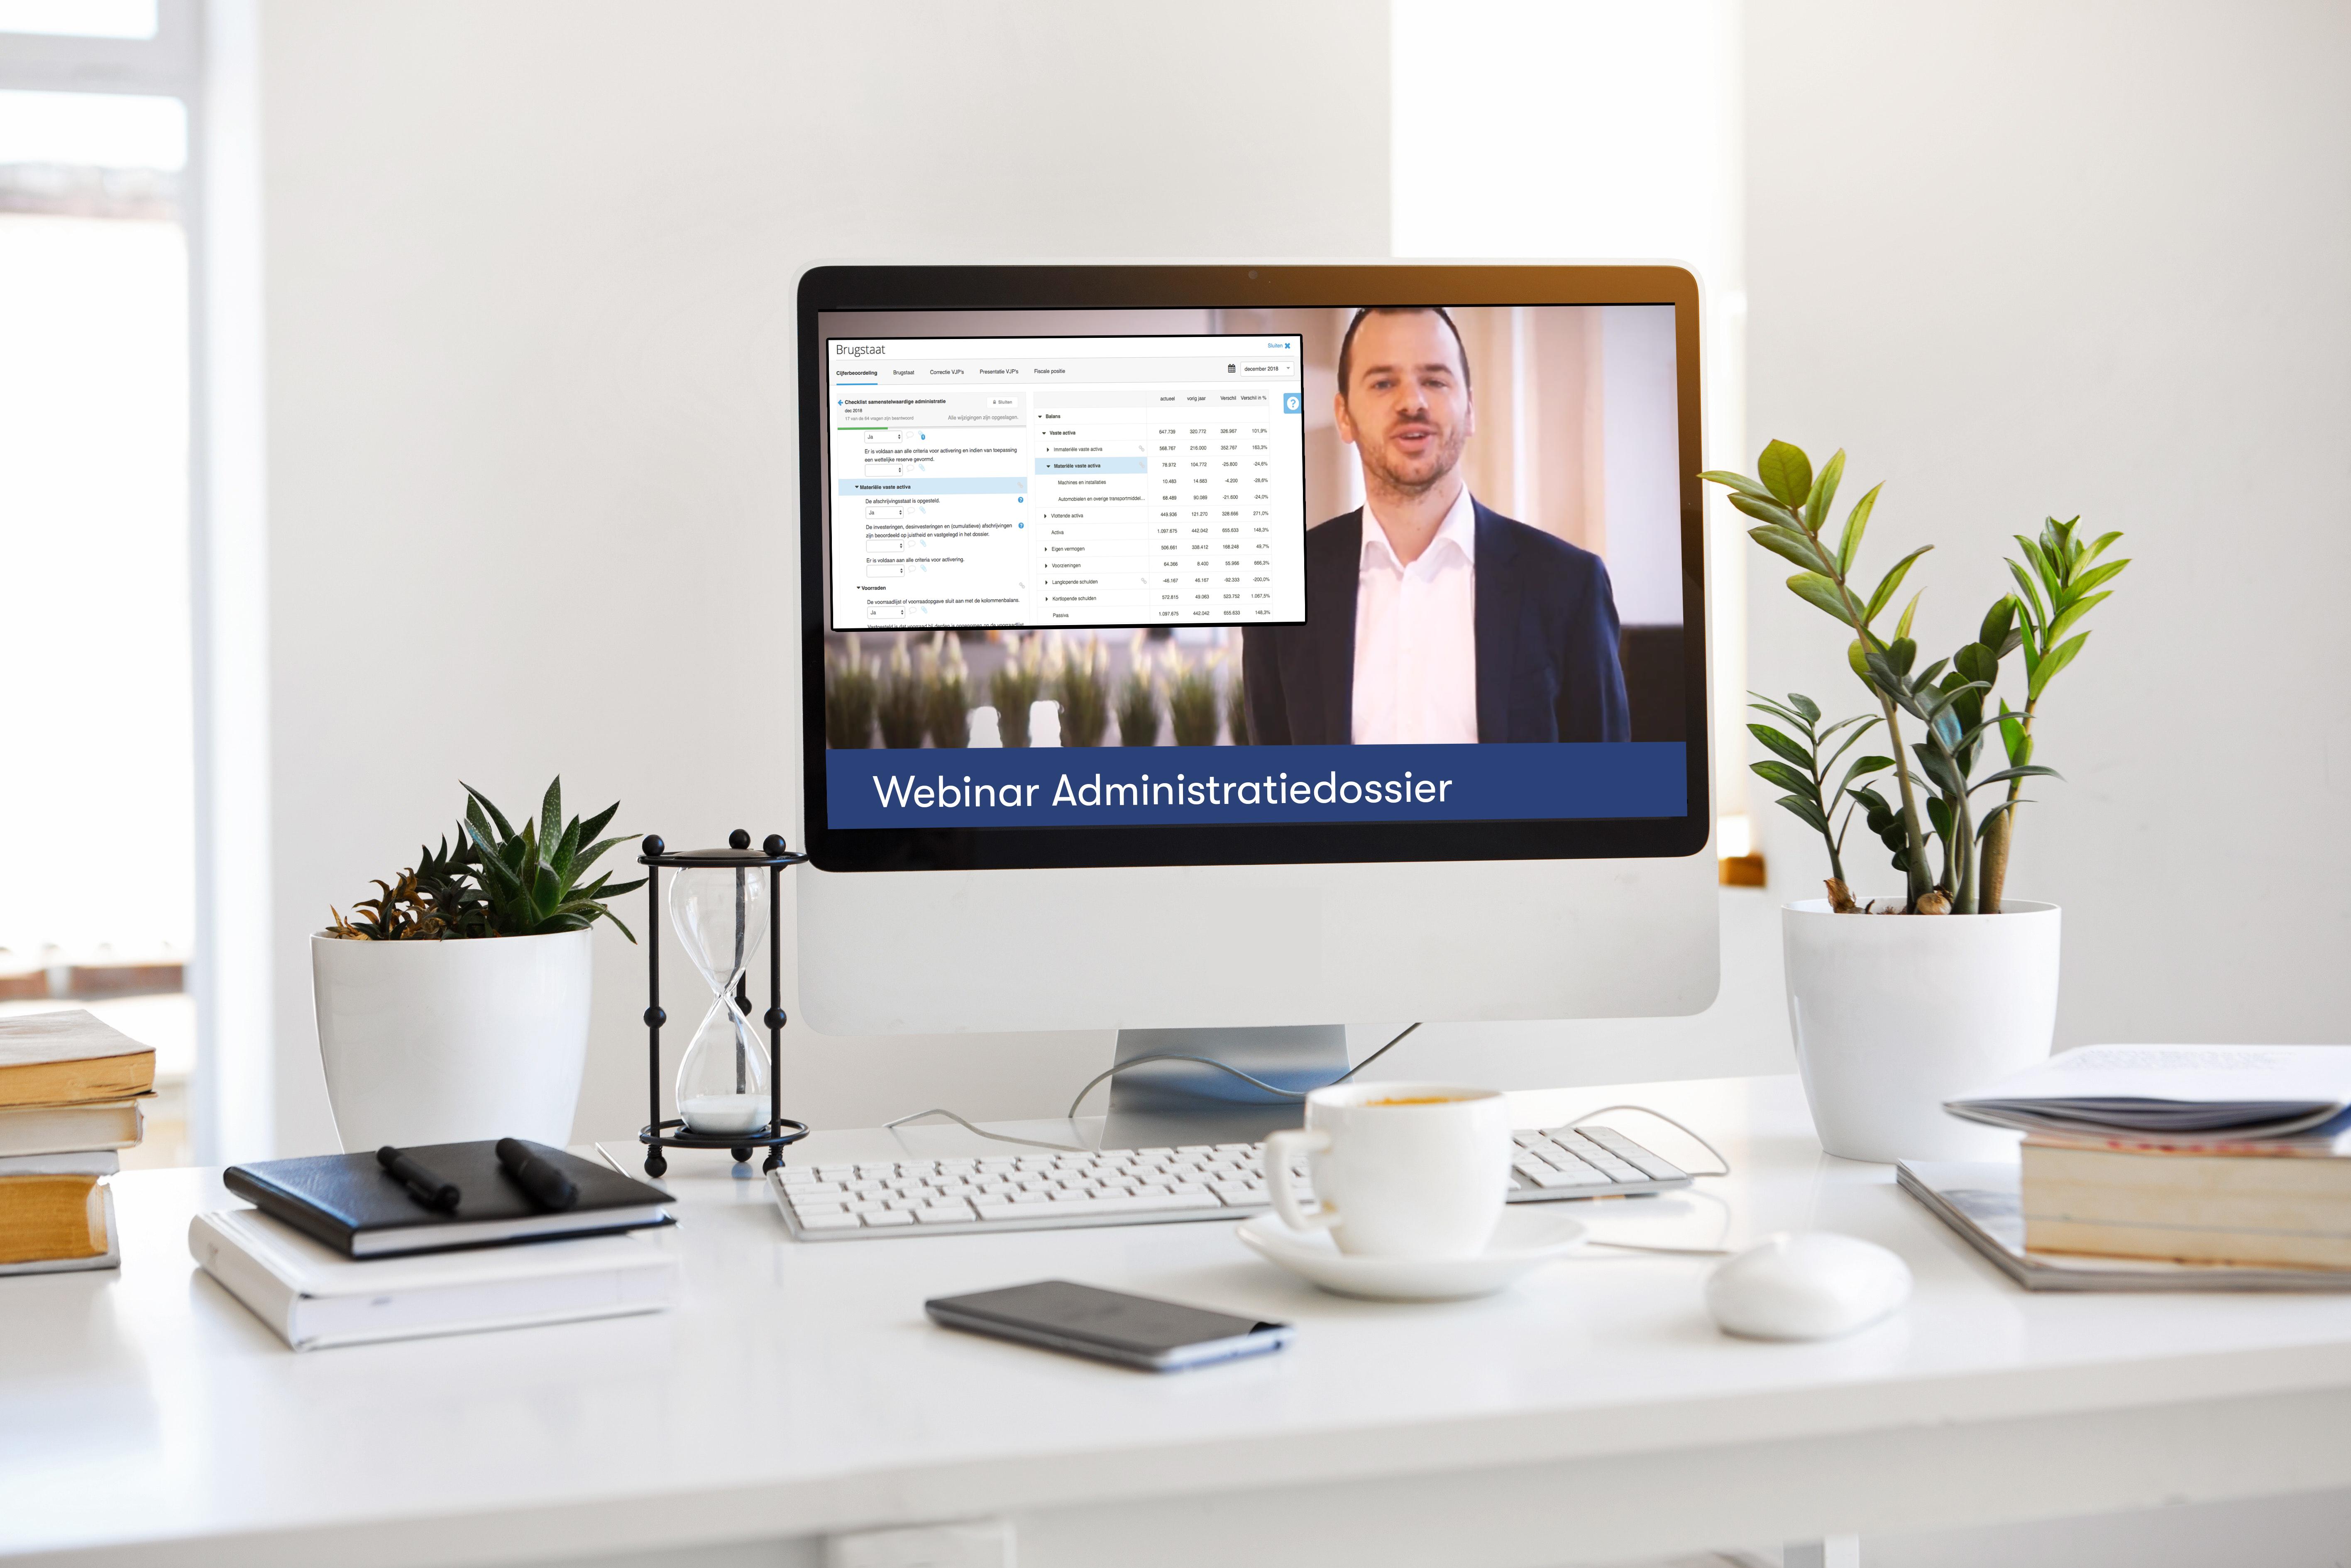 webinar administratiedossier